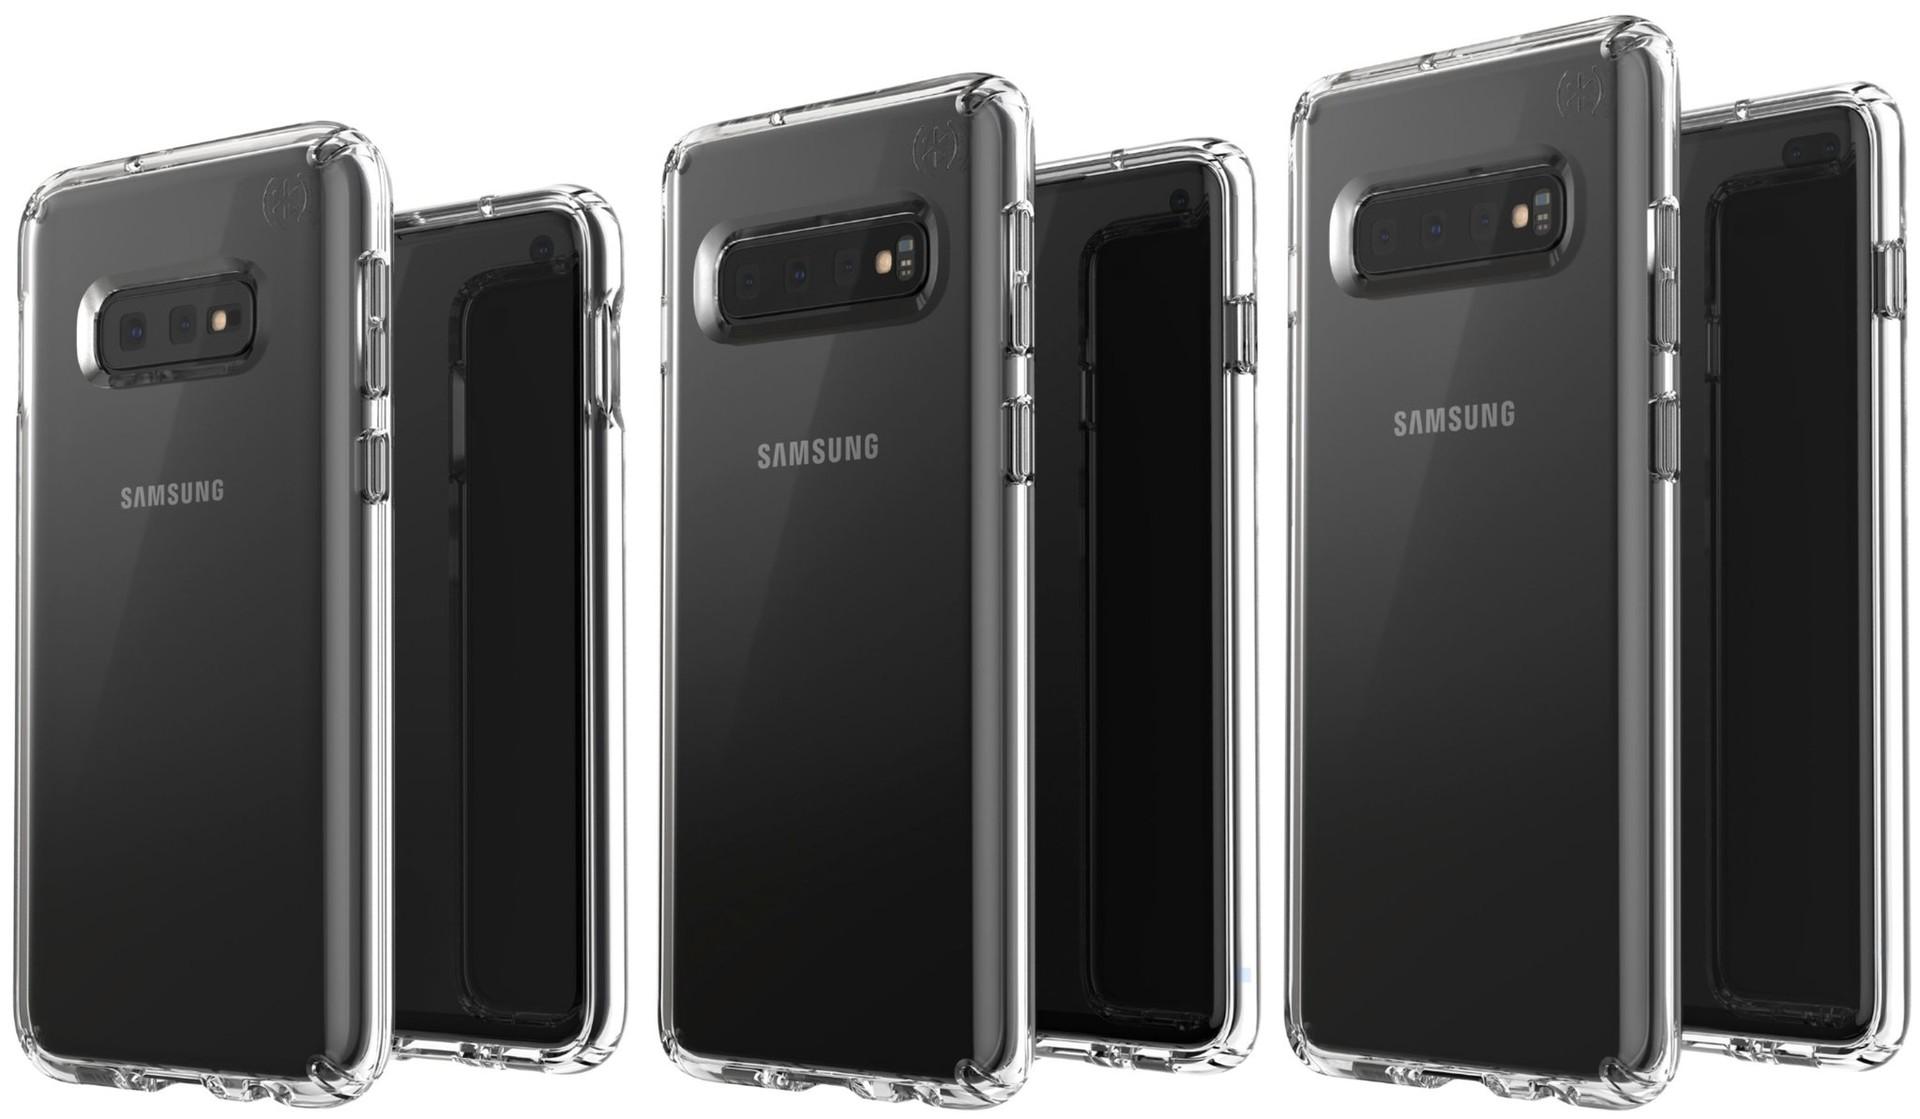 Les trois variantes de la gamme Samsung Galaxy S10 en fuite